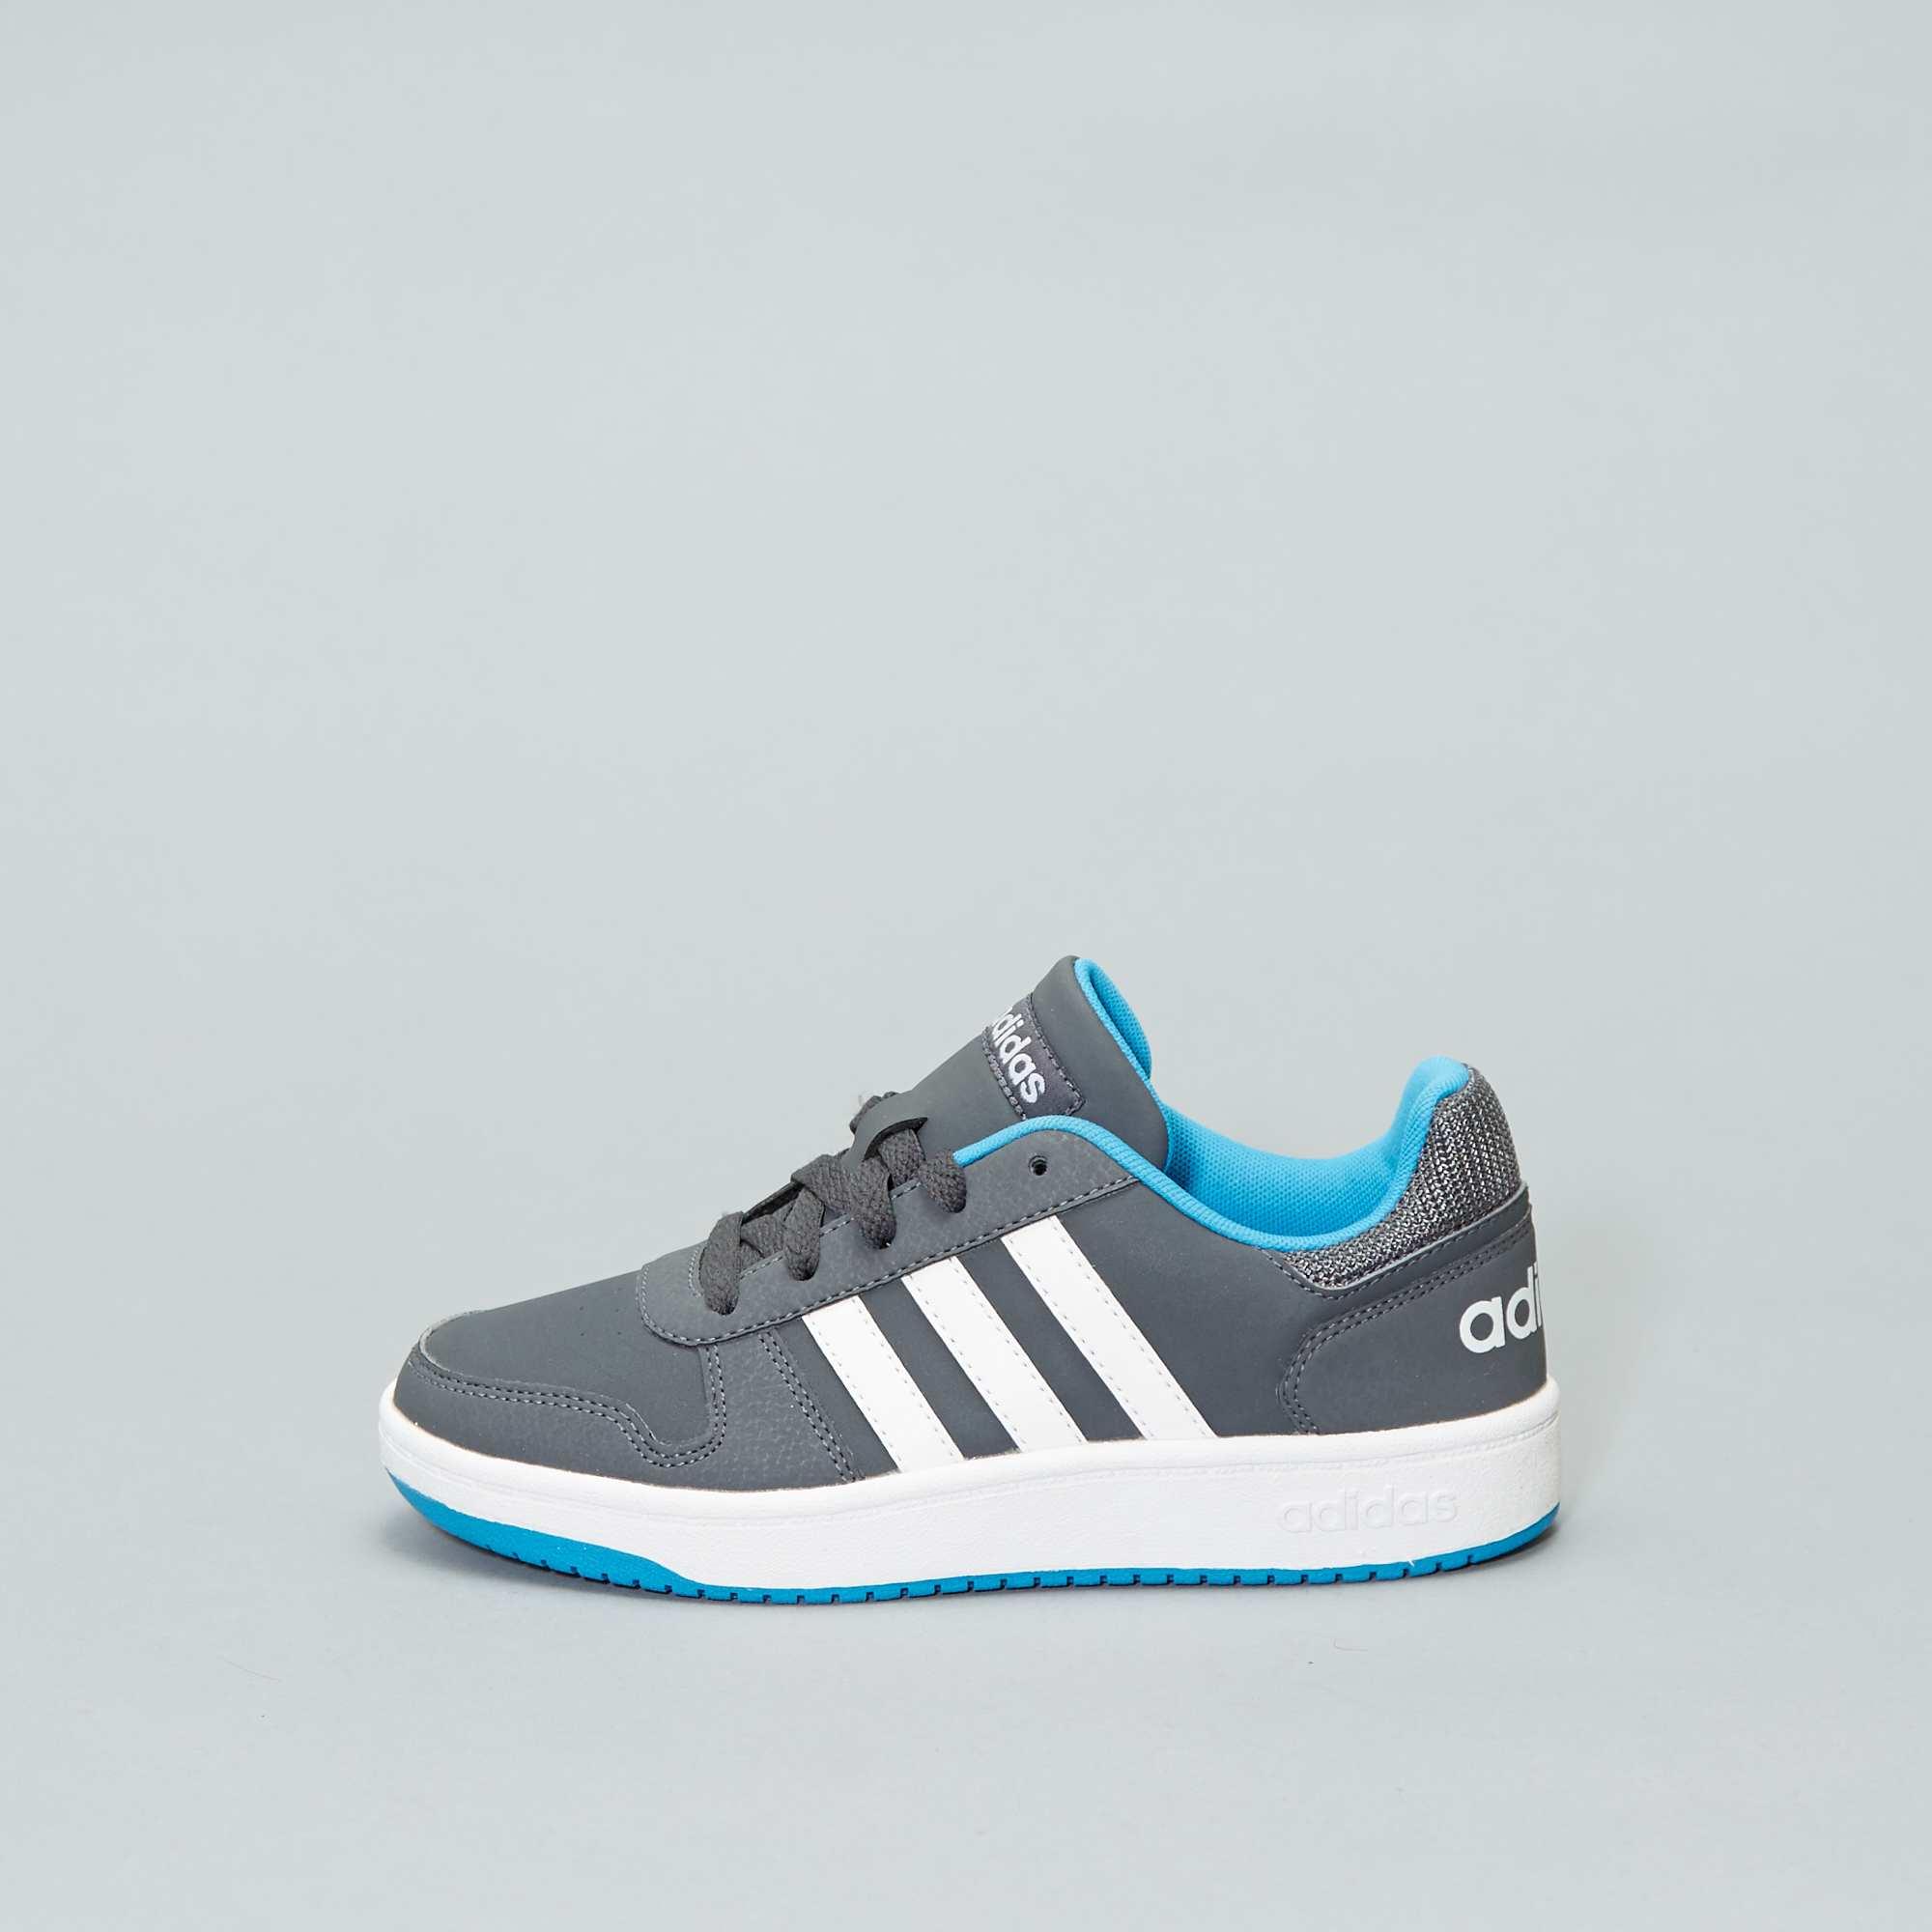 2c2b4511f7047 Baskets  Adidas Hoops 2 0 K  Garçon adolescent - gris - Kiabi - 40